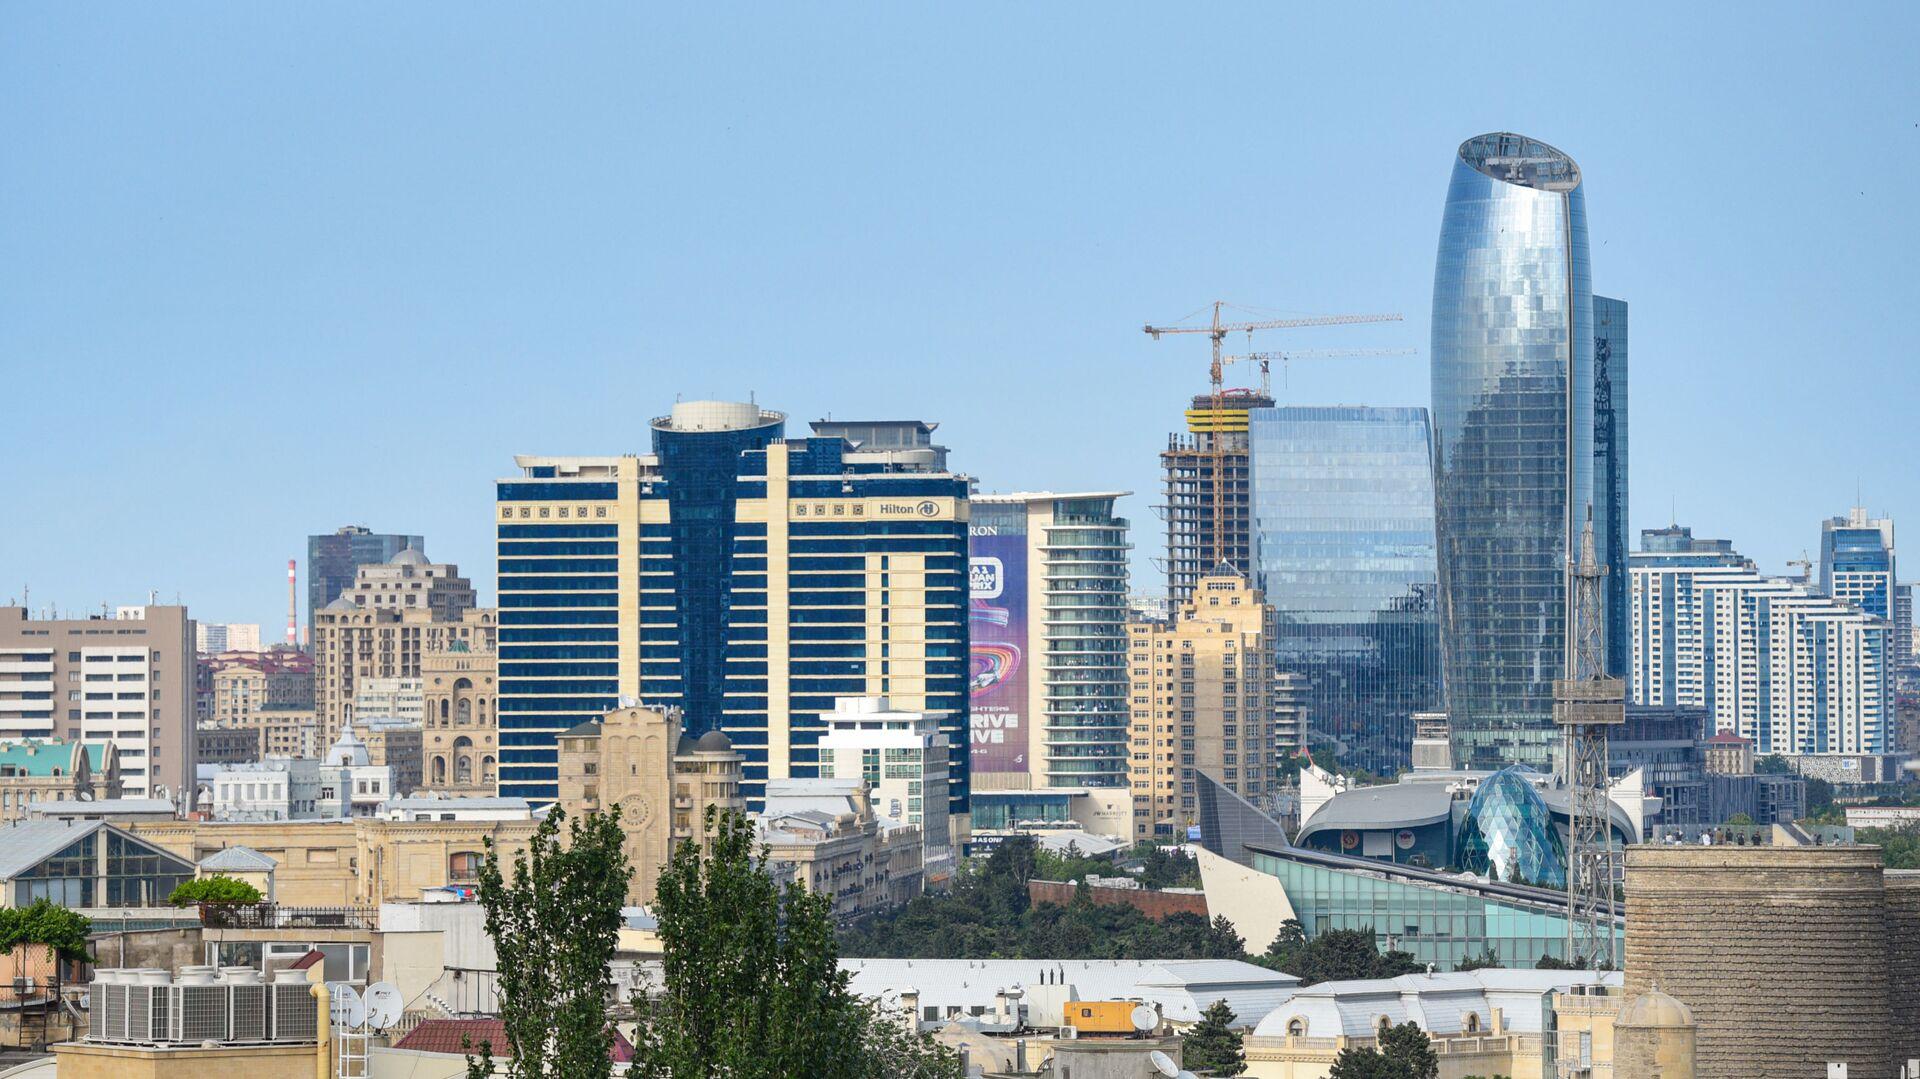 Вид на город Баку, фото из архива - Sputnik Азербайджан, 1920, 13.09.2021